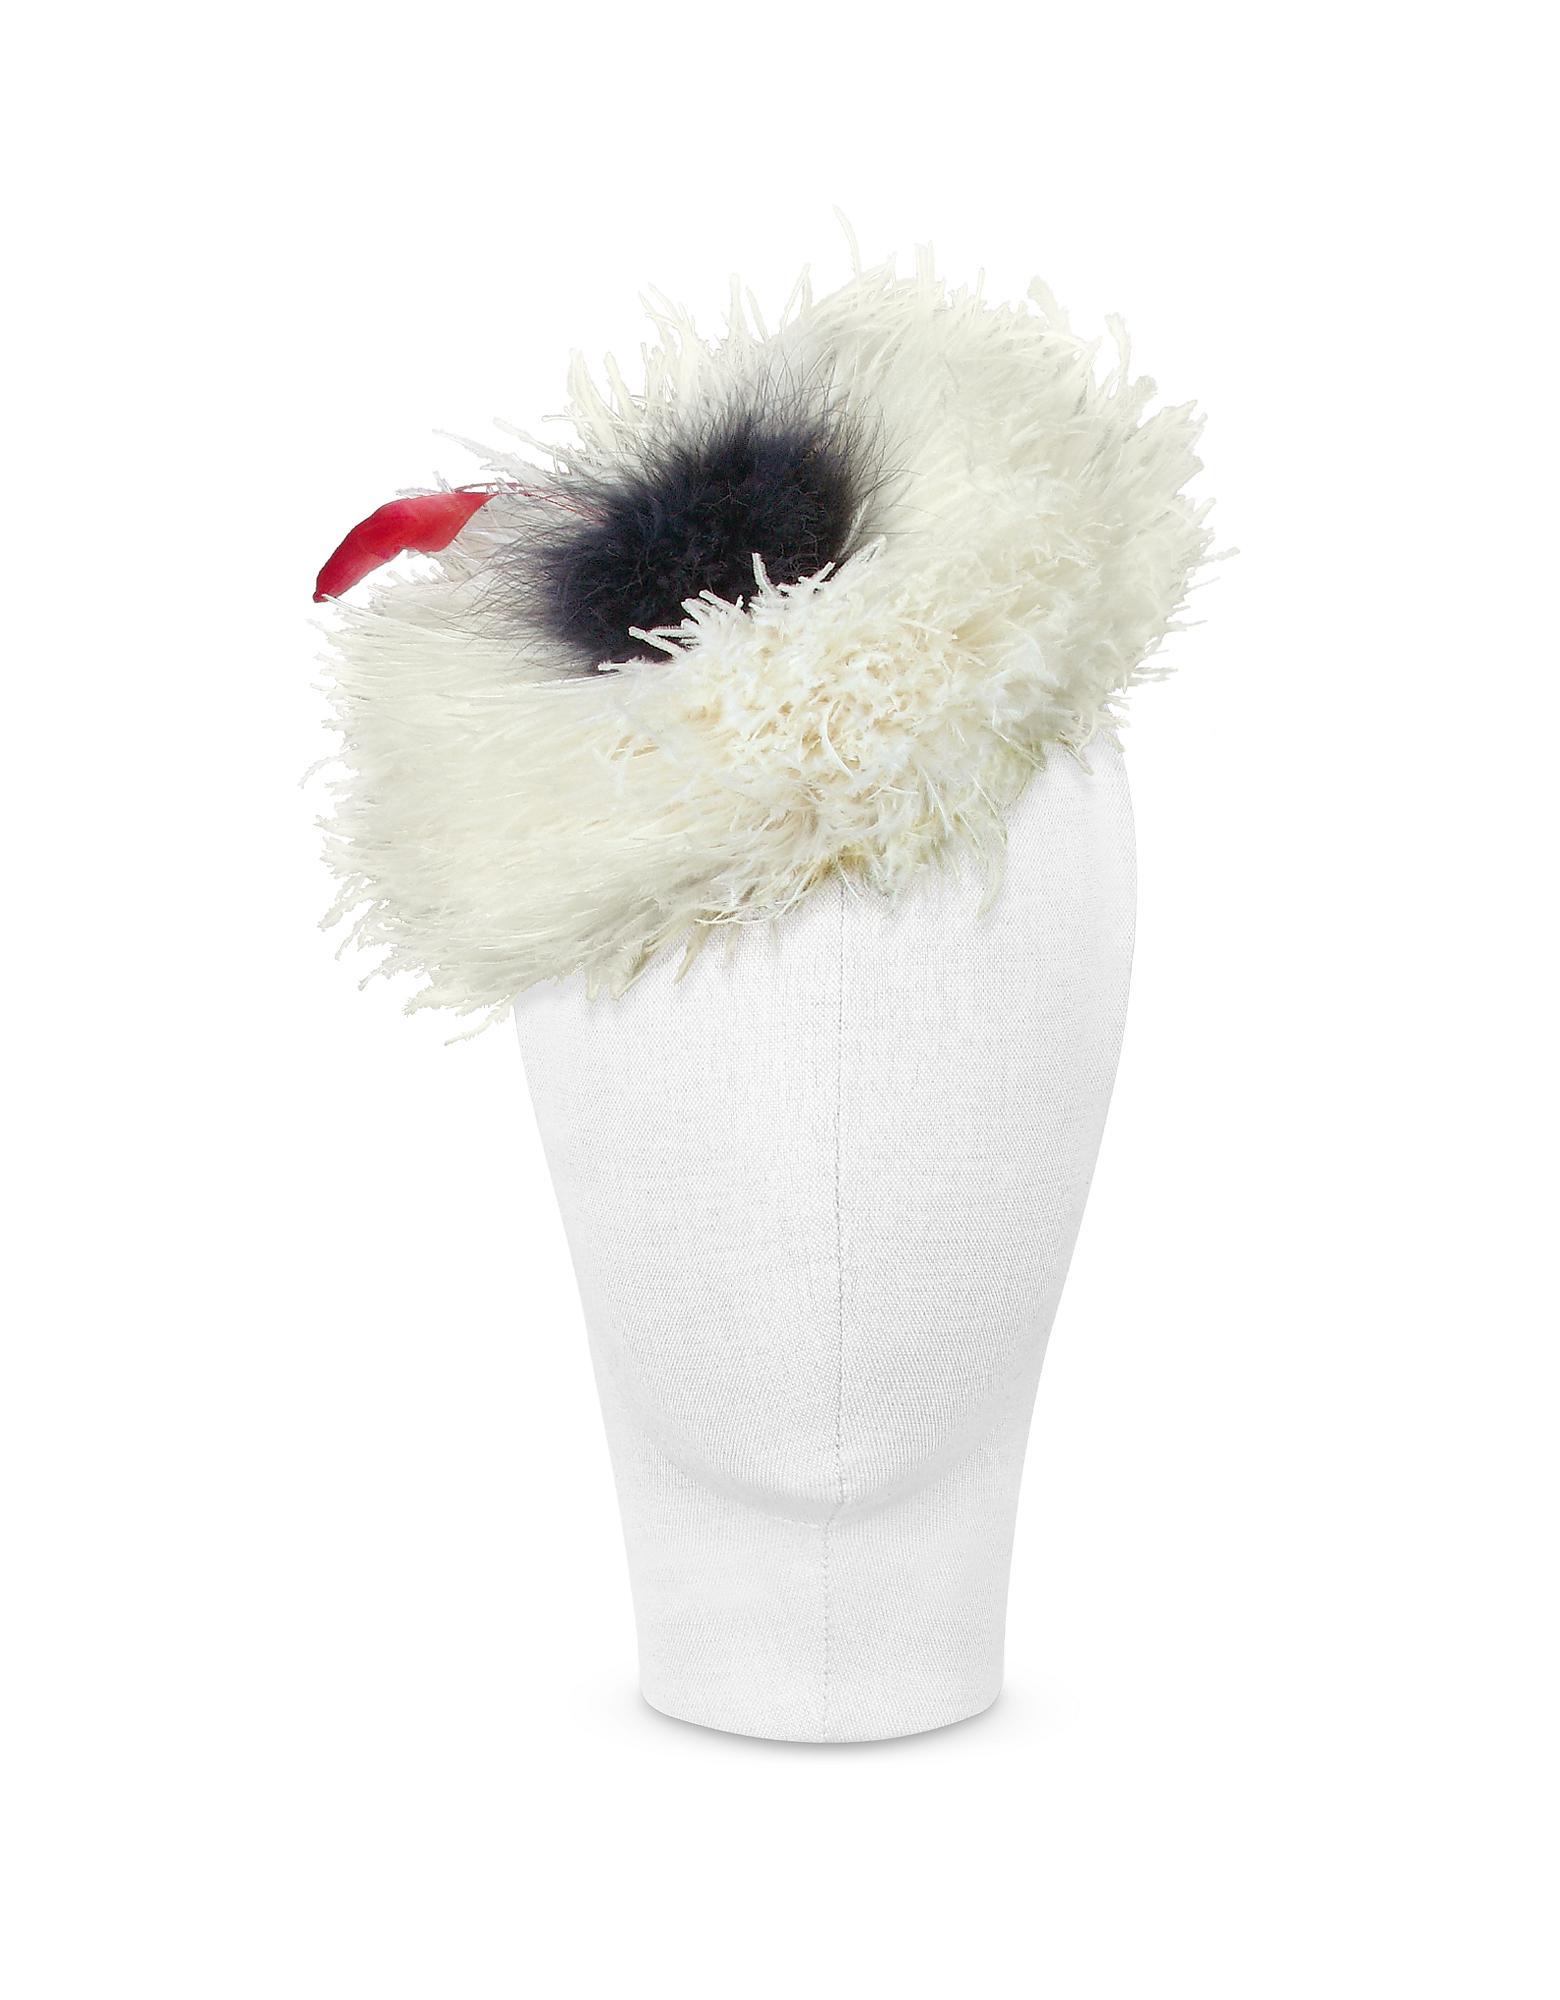 1cd8a93adcd Lyst - Nana  Abigail - Ivory Ostrich Feather Headdress in Black - Save  30.092592592592595%